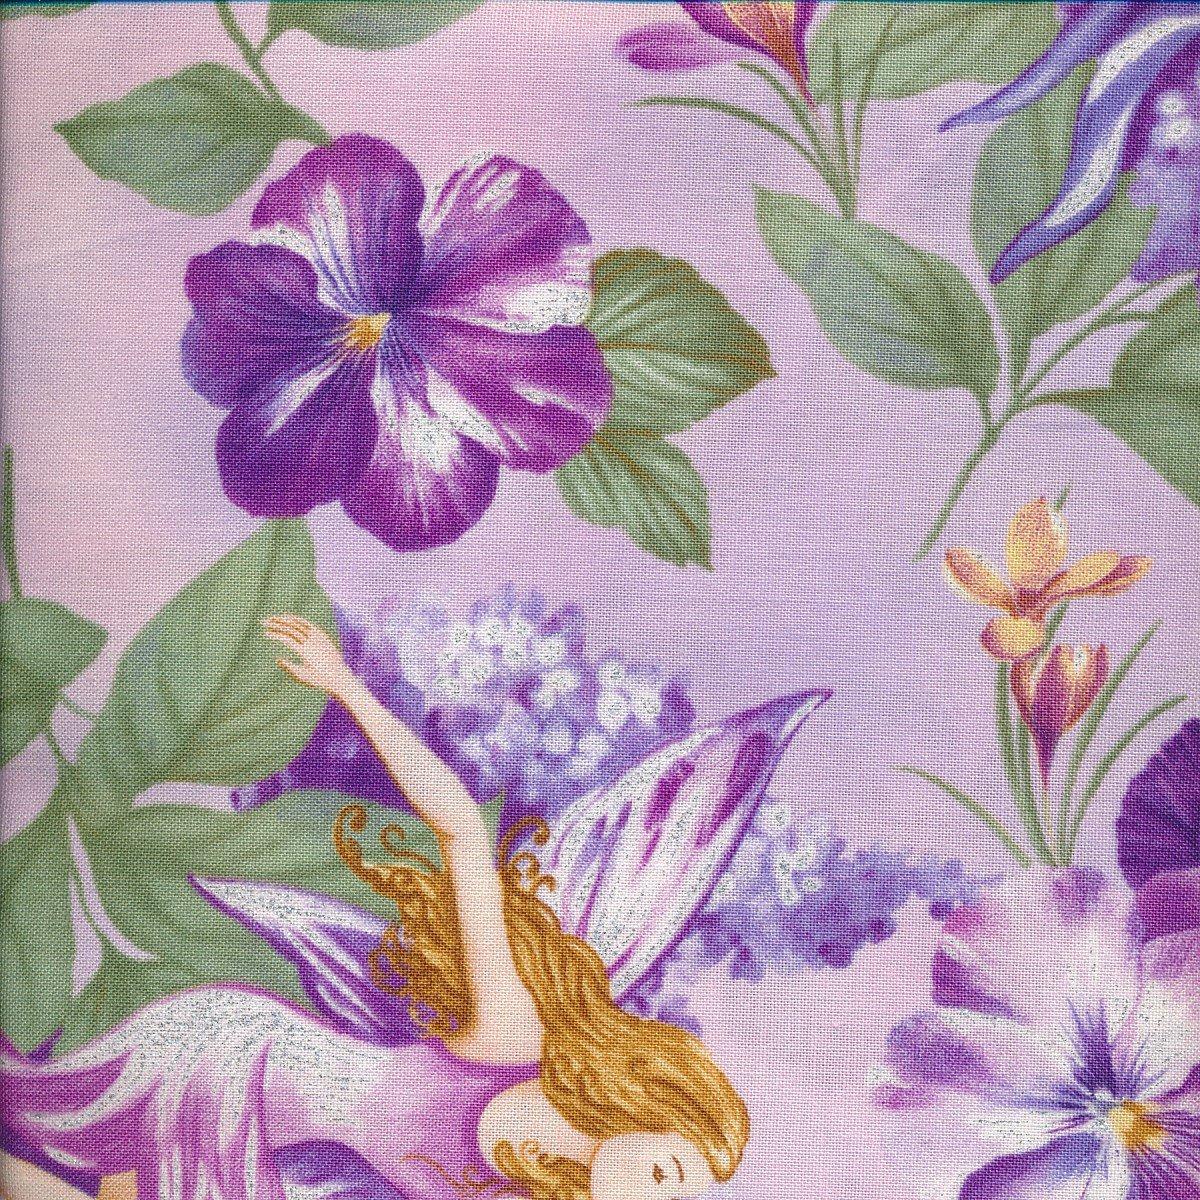 Flower Fairies on Lavender